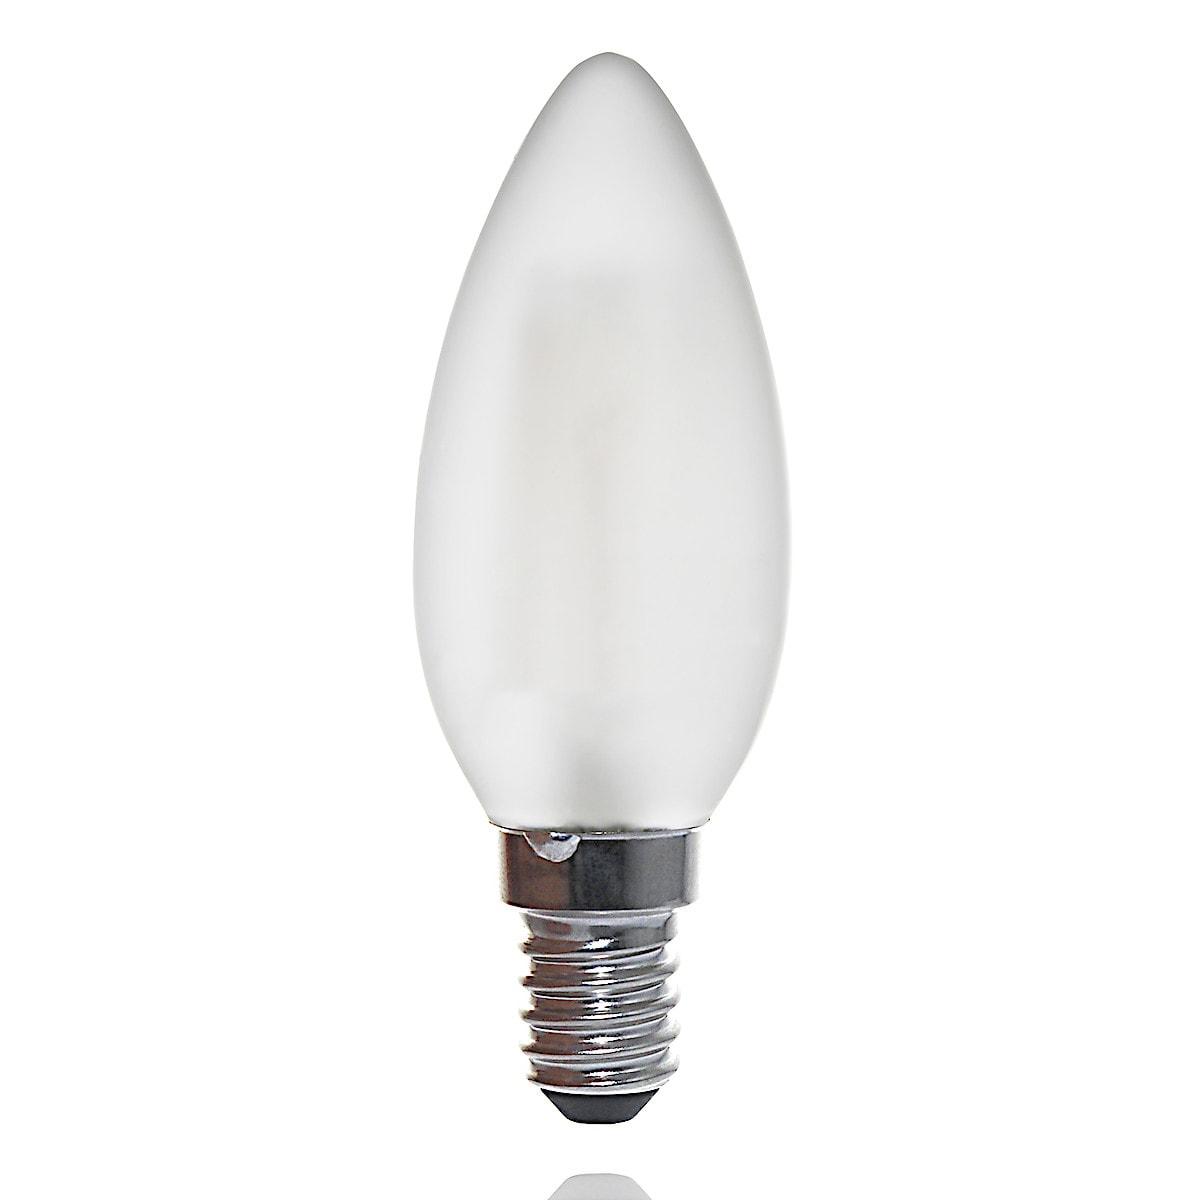 Dimbar kronljuslampa LED E14 Clas Ohlson